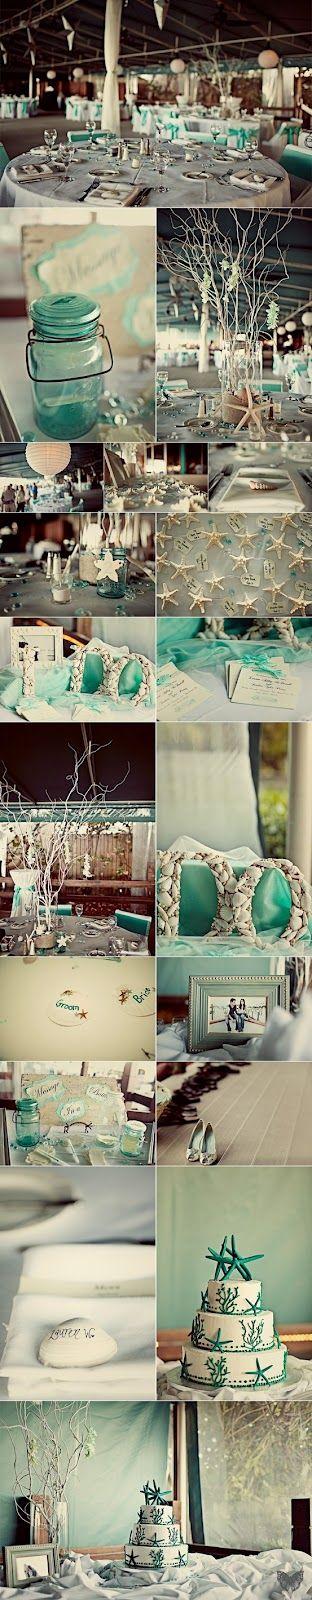 sea theme wedding inspiration palette aqua turquoise white